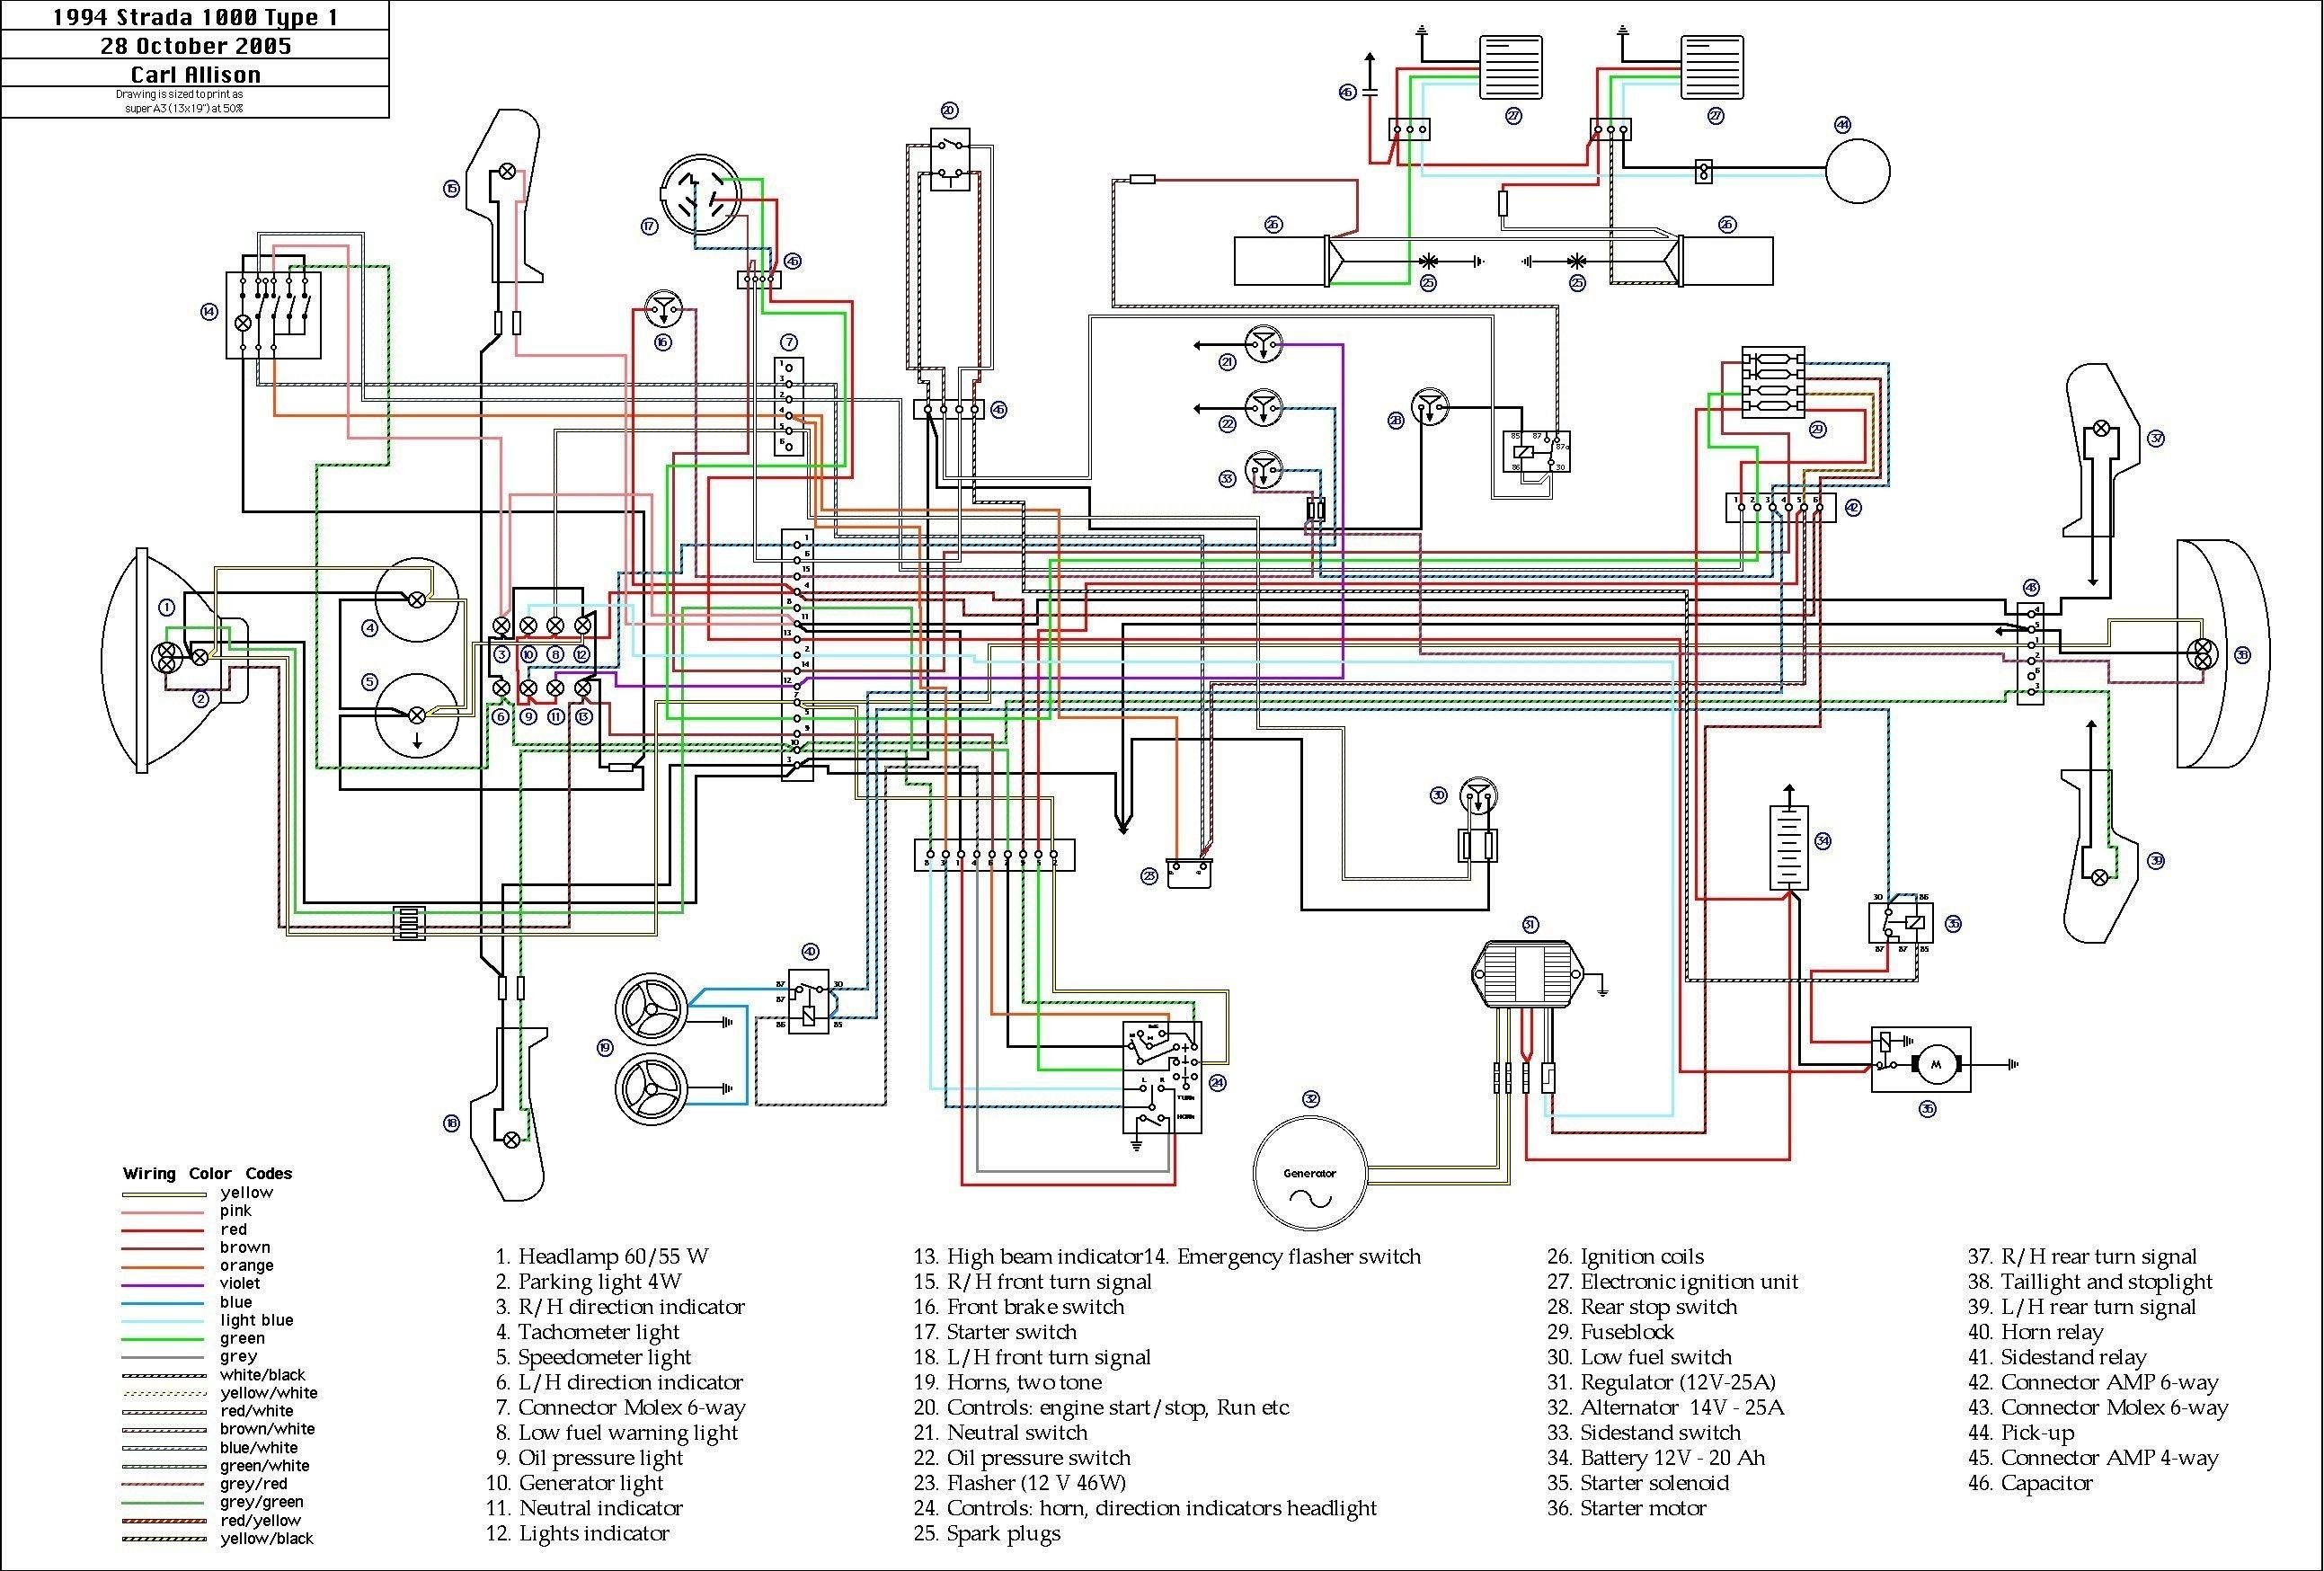 Unique Audi A4 B8 Headlight Wiring Diagram #diagram #diagramtemplate  #diagramsample Check more at ht…   Sistema electrico, Yamaha dt, Diagrama  de circuito eléctrico